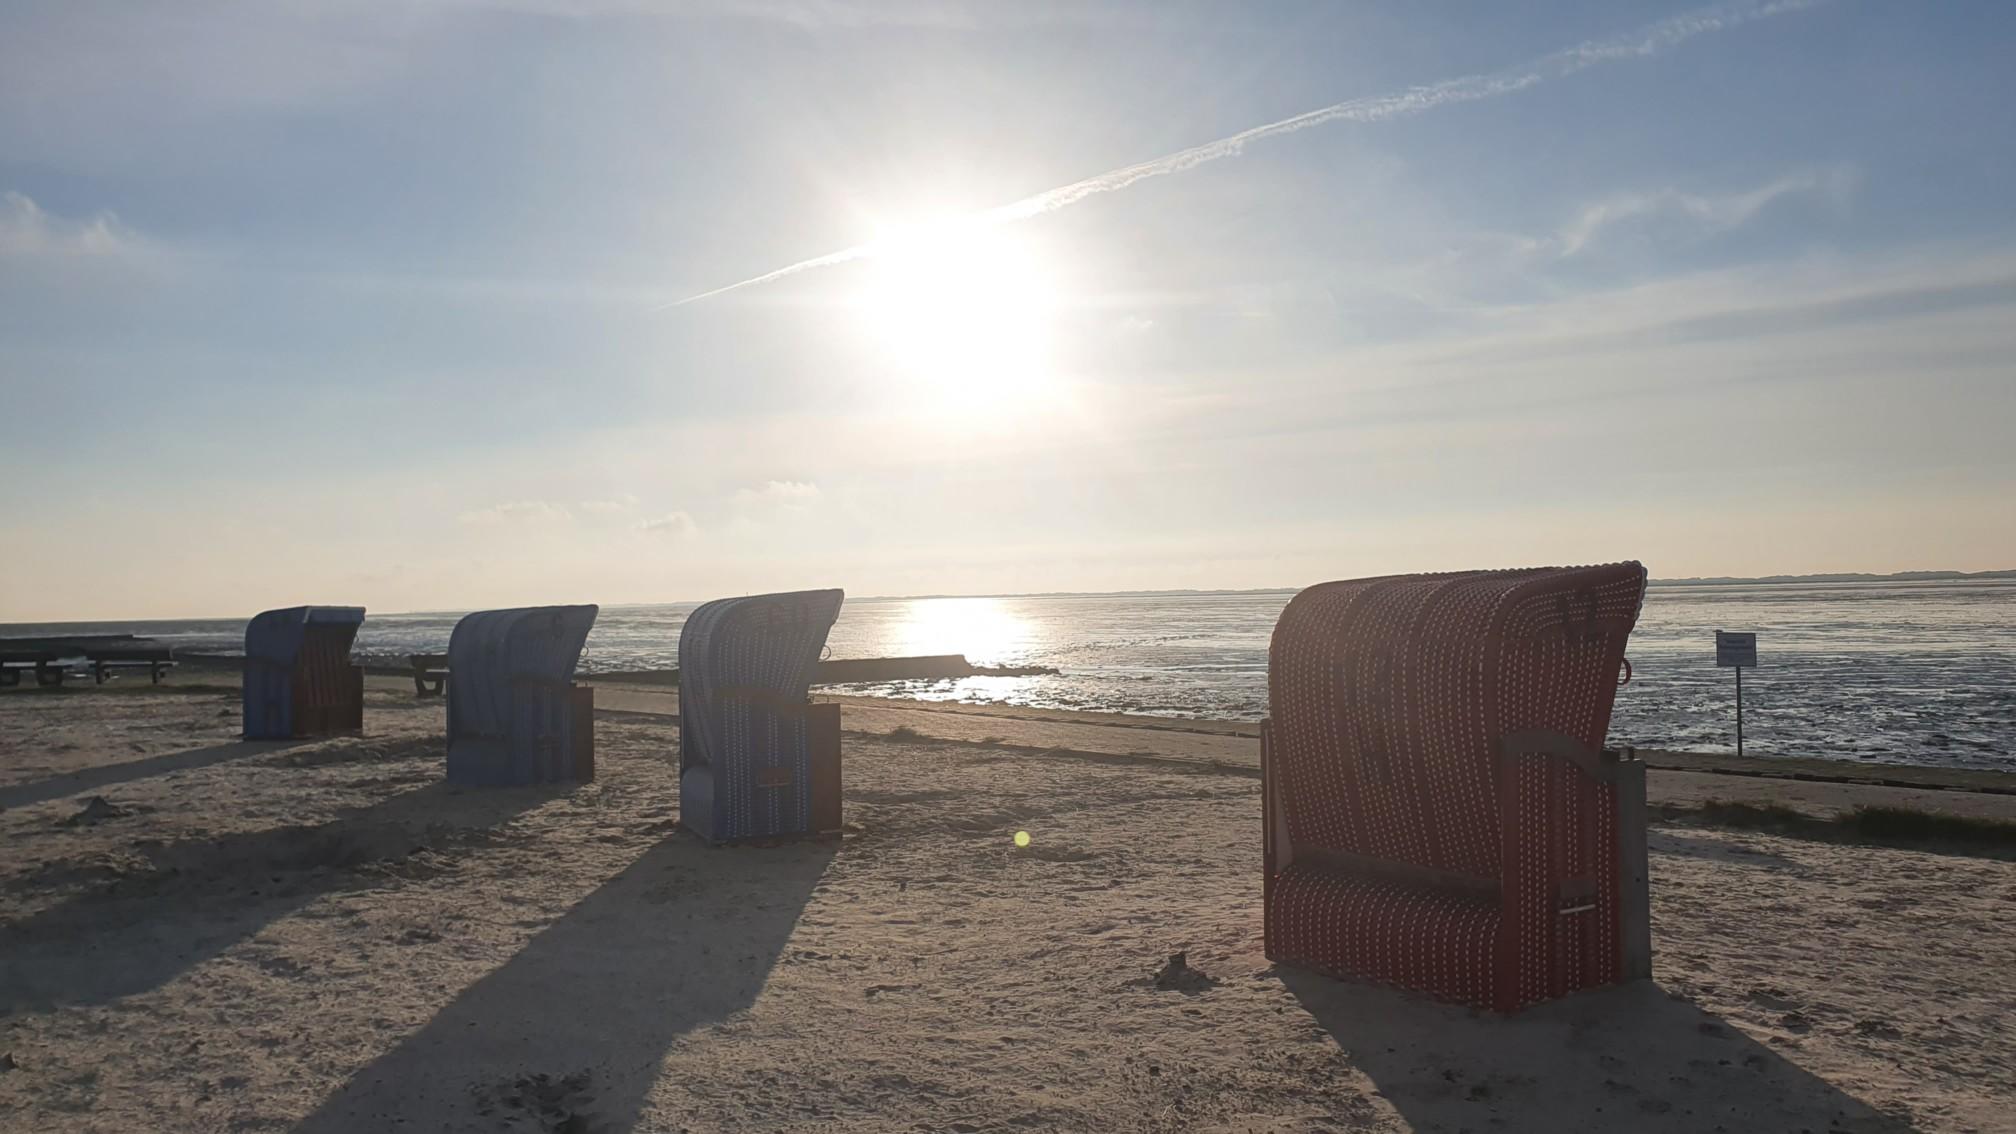 Strandkörbe bei Dornum